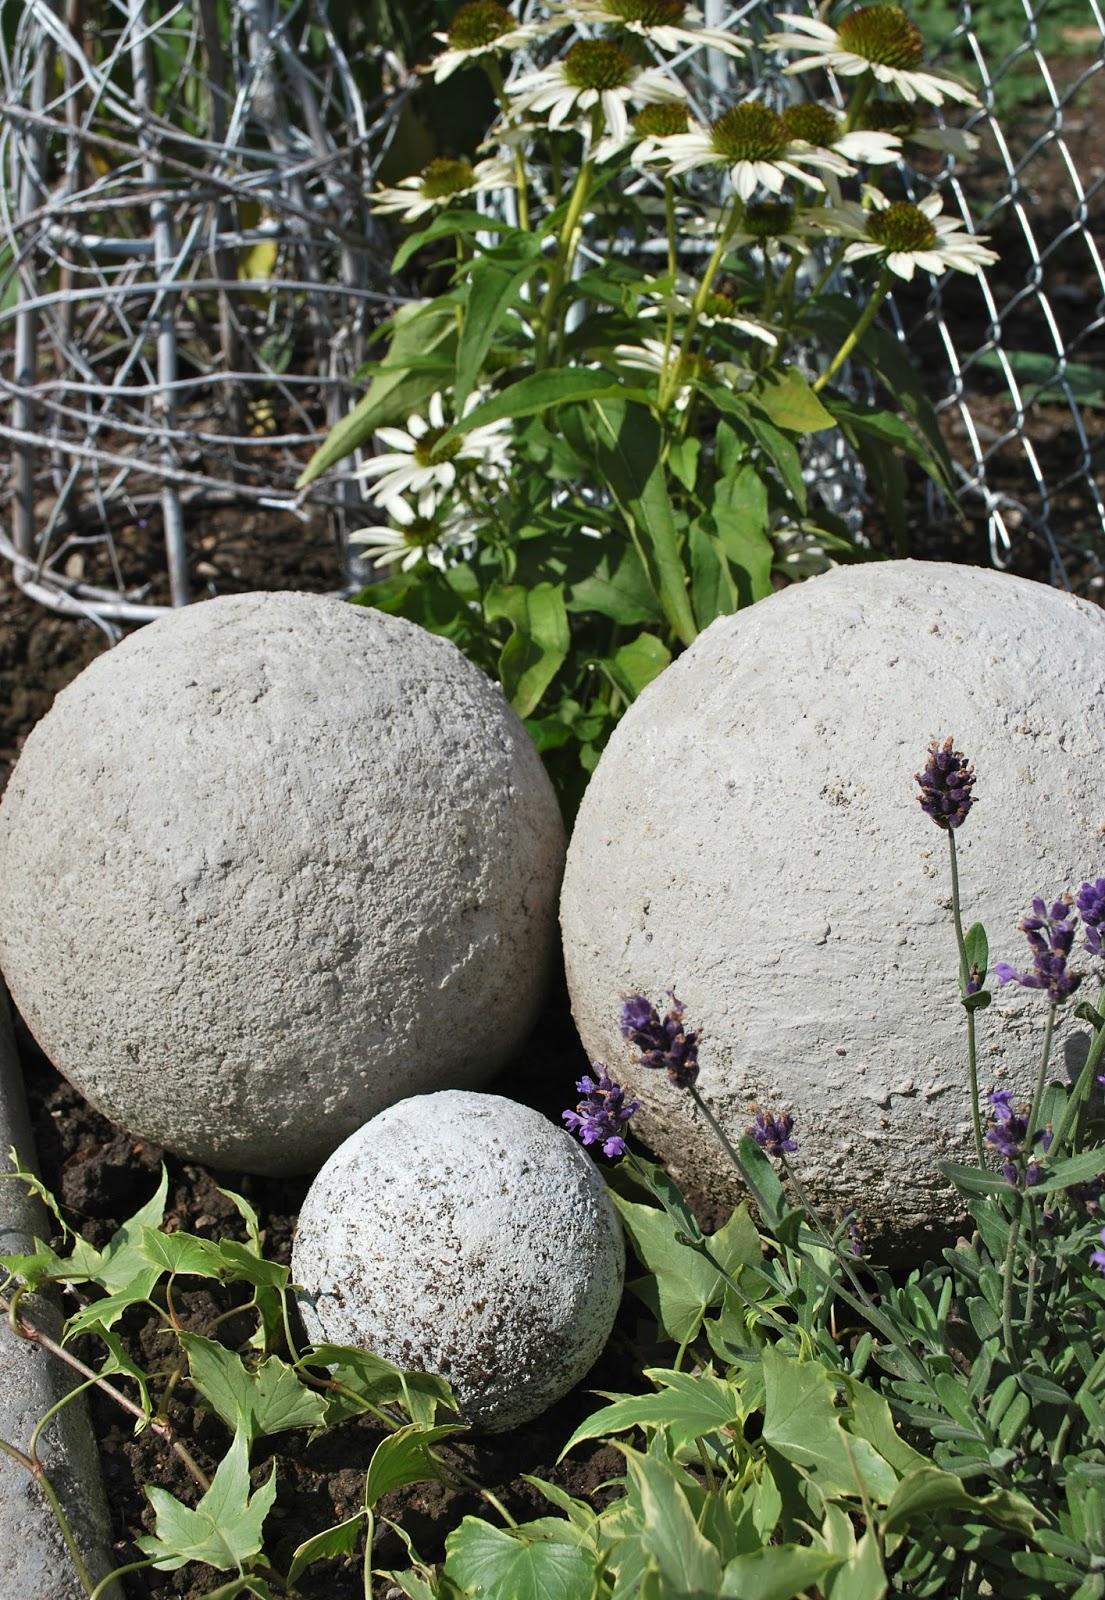 mamas kram betonkugeln im neuen blumenbeet. Black Bedroom Furniture Sets. Home Design Ideas